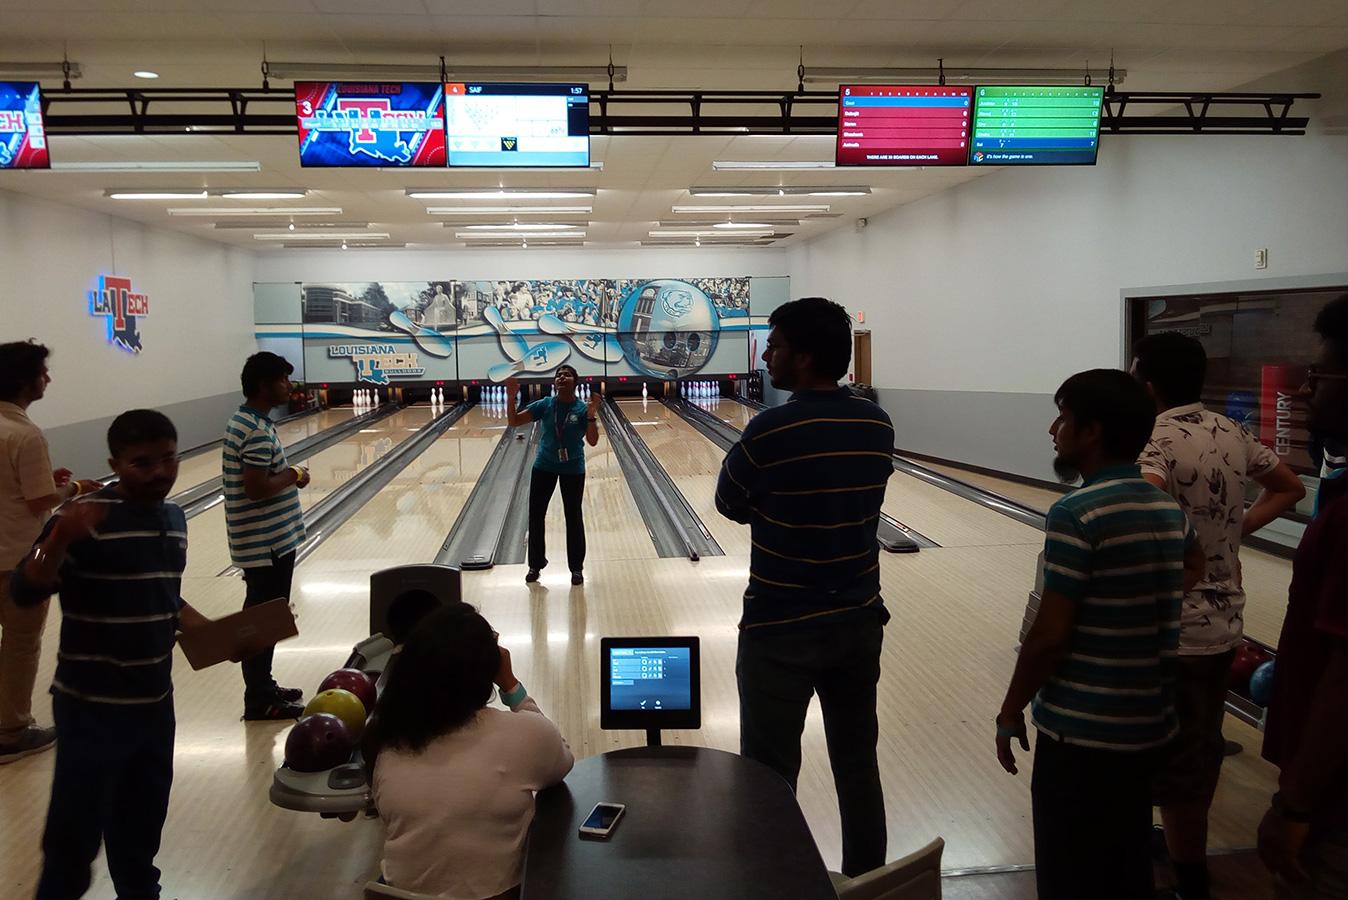 Graduate social at a bowling alley